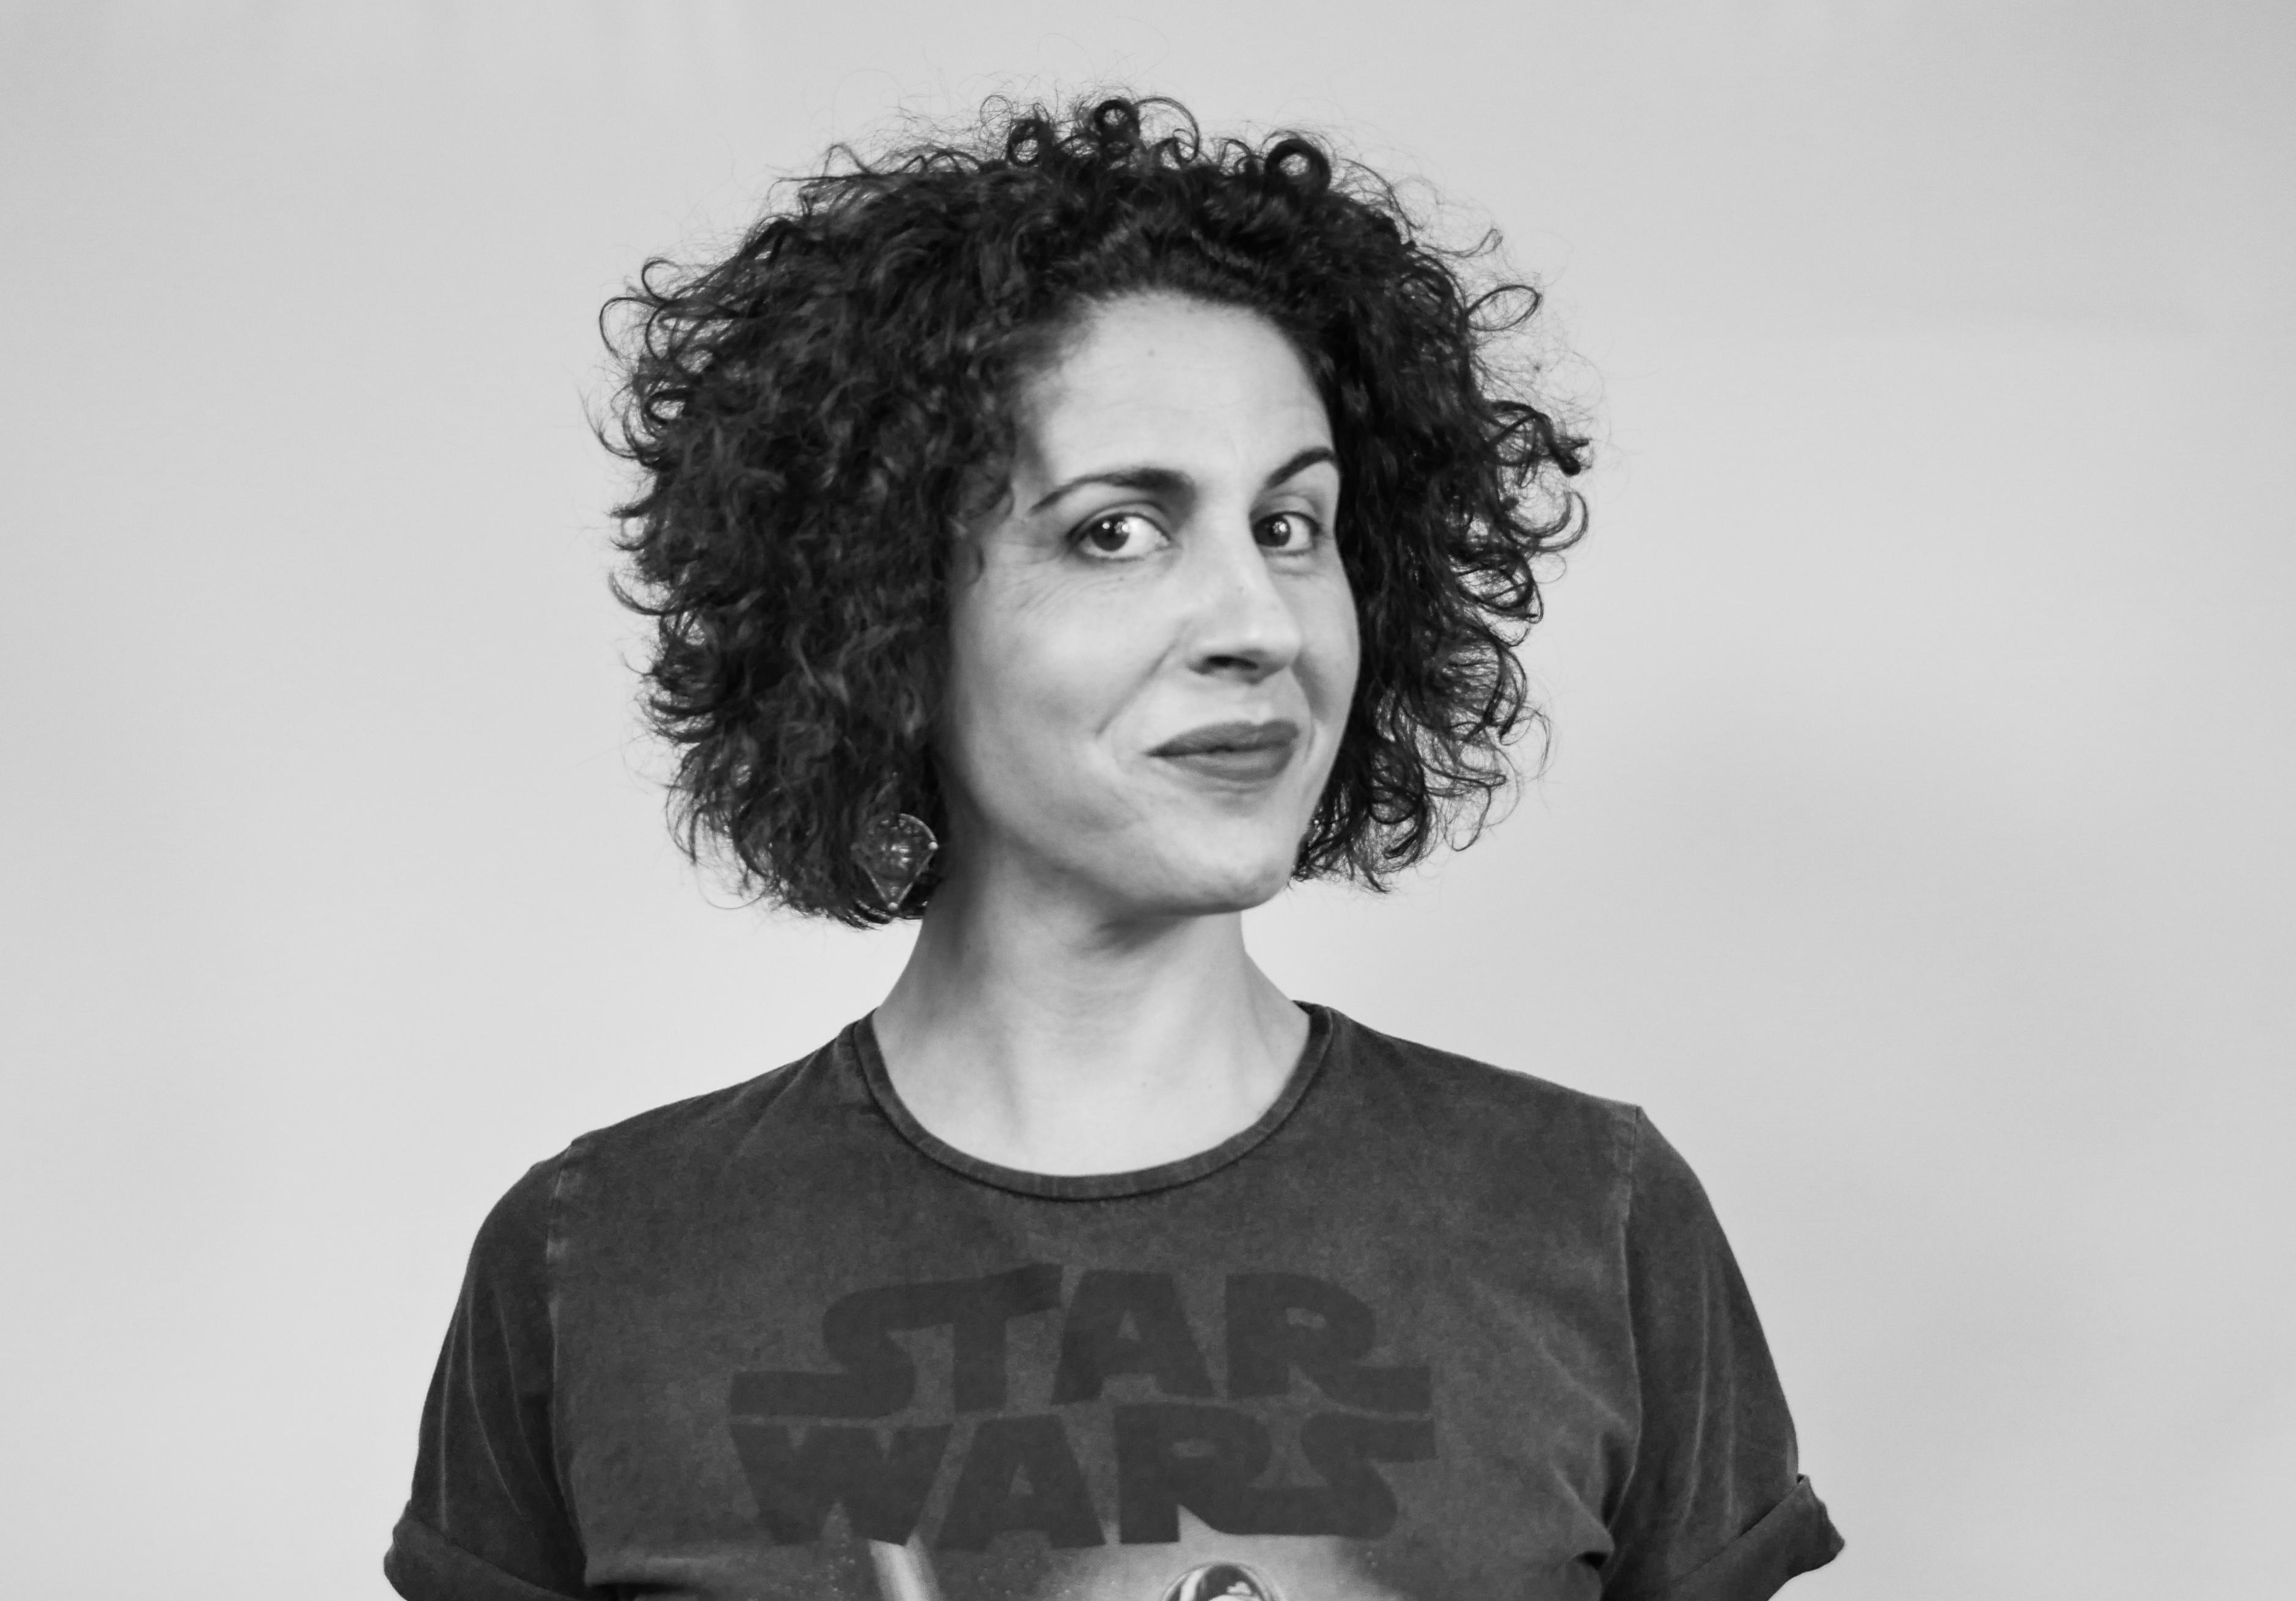 DianaGarrido